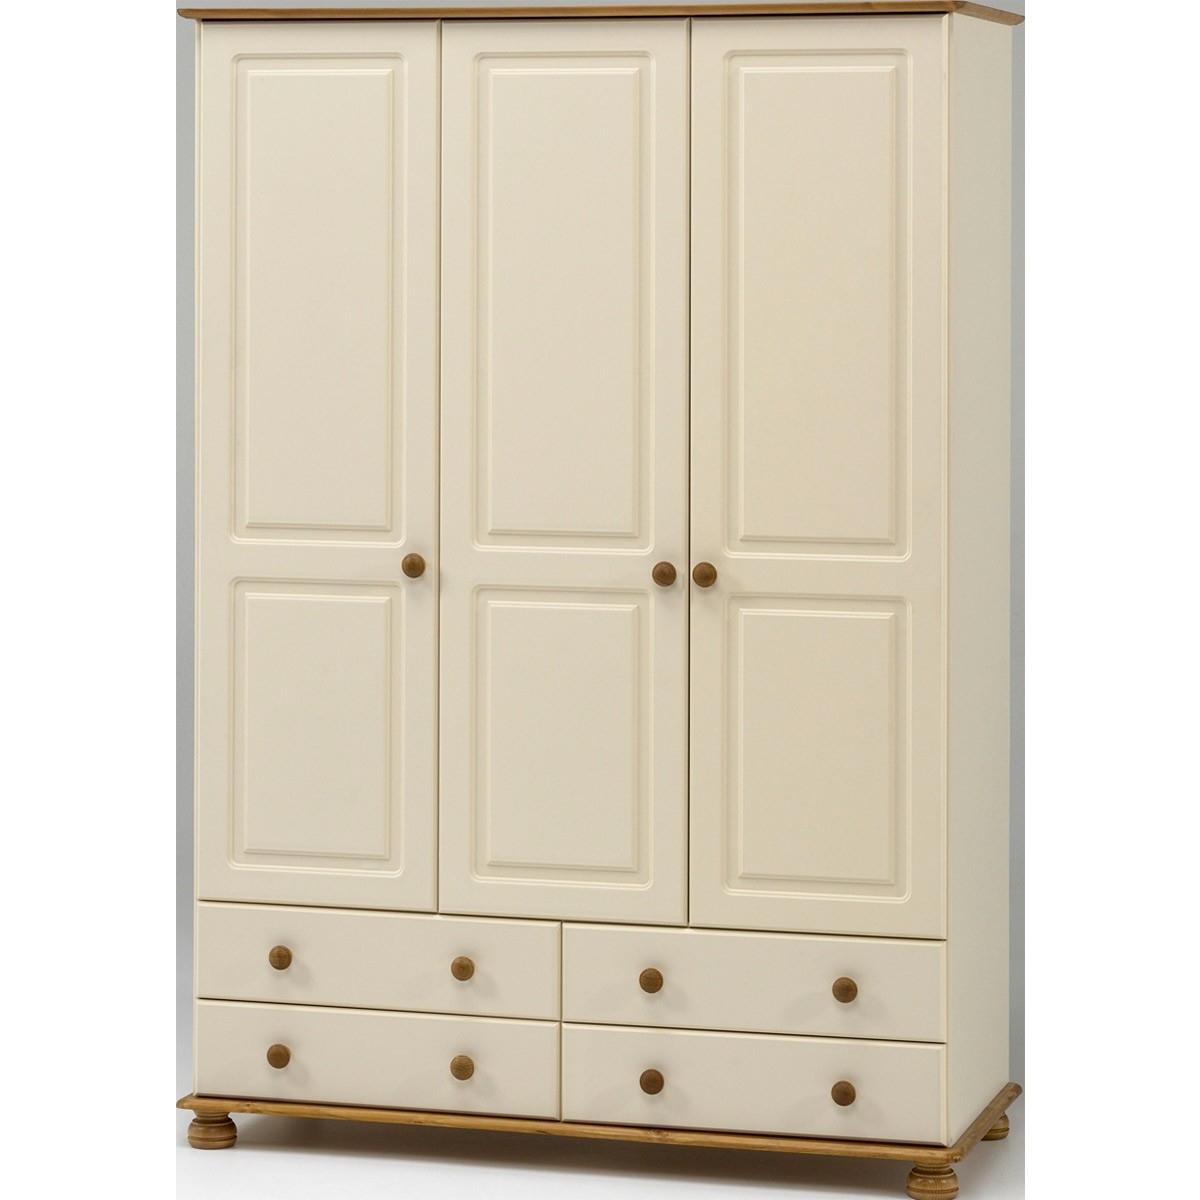 Most Recent 3 Door Pine Wardrobes Within Salisbury Cream And Pine 3 Door 4 Drawer Wardrobe From The (View 2 of 15)